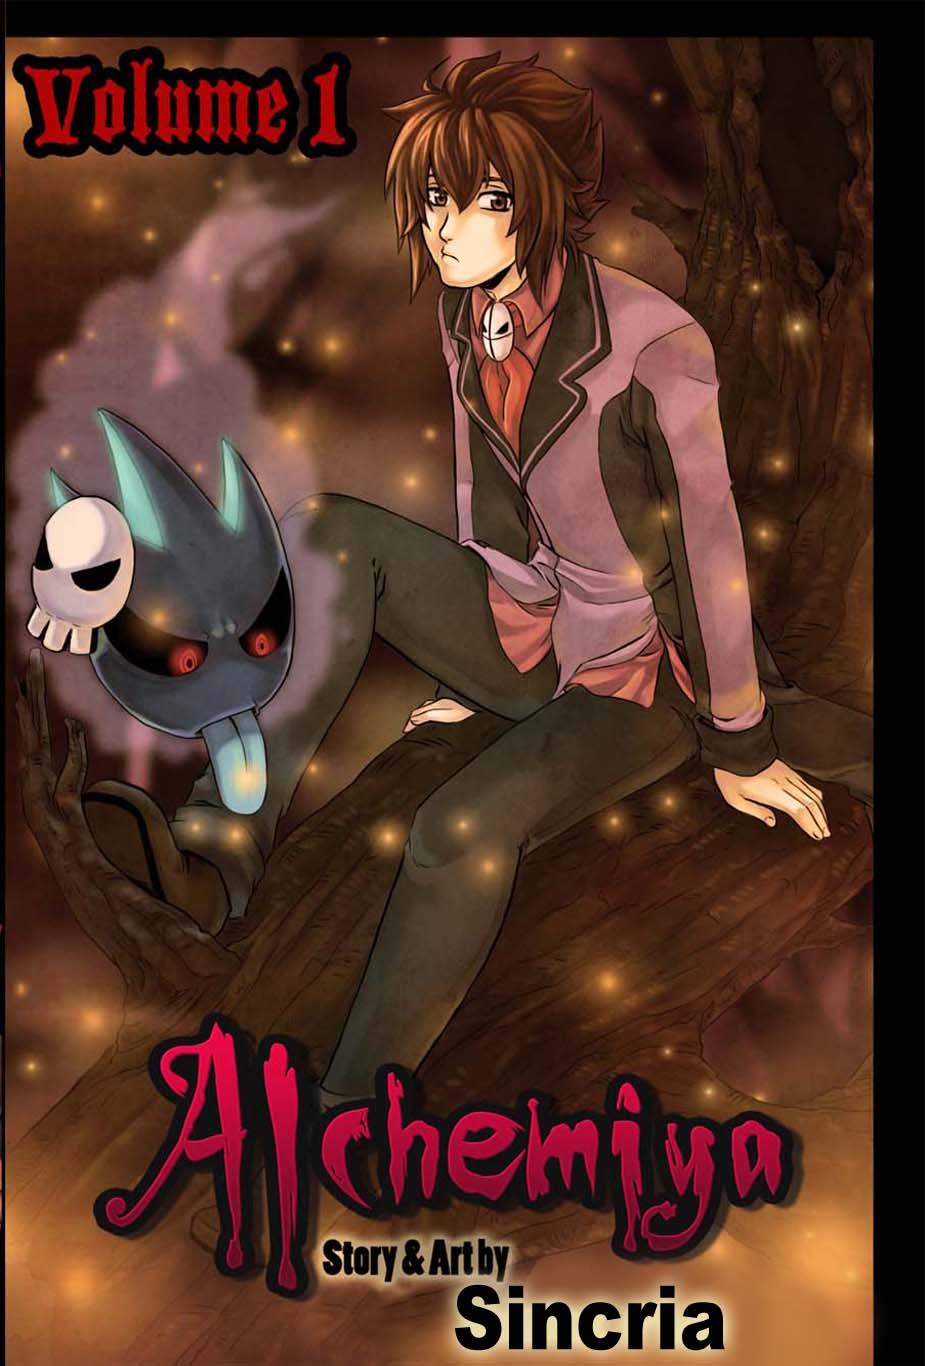 Alchemiya cover page by CyberIrina